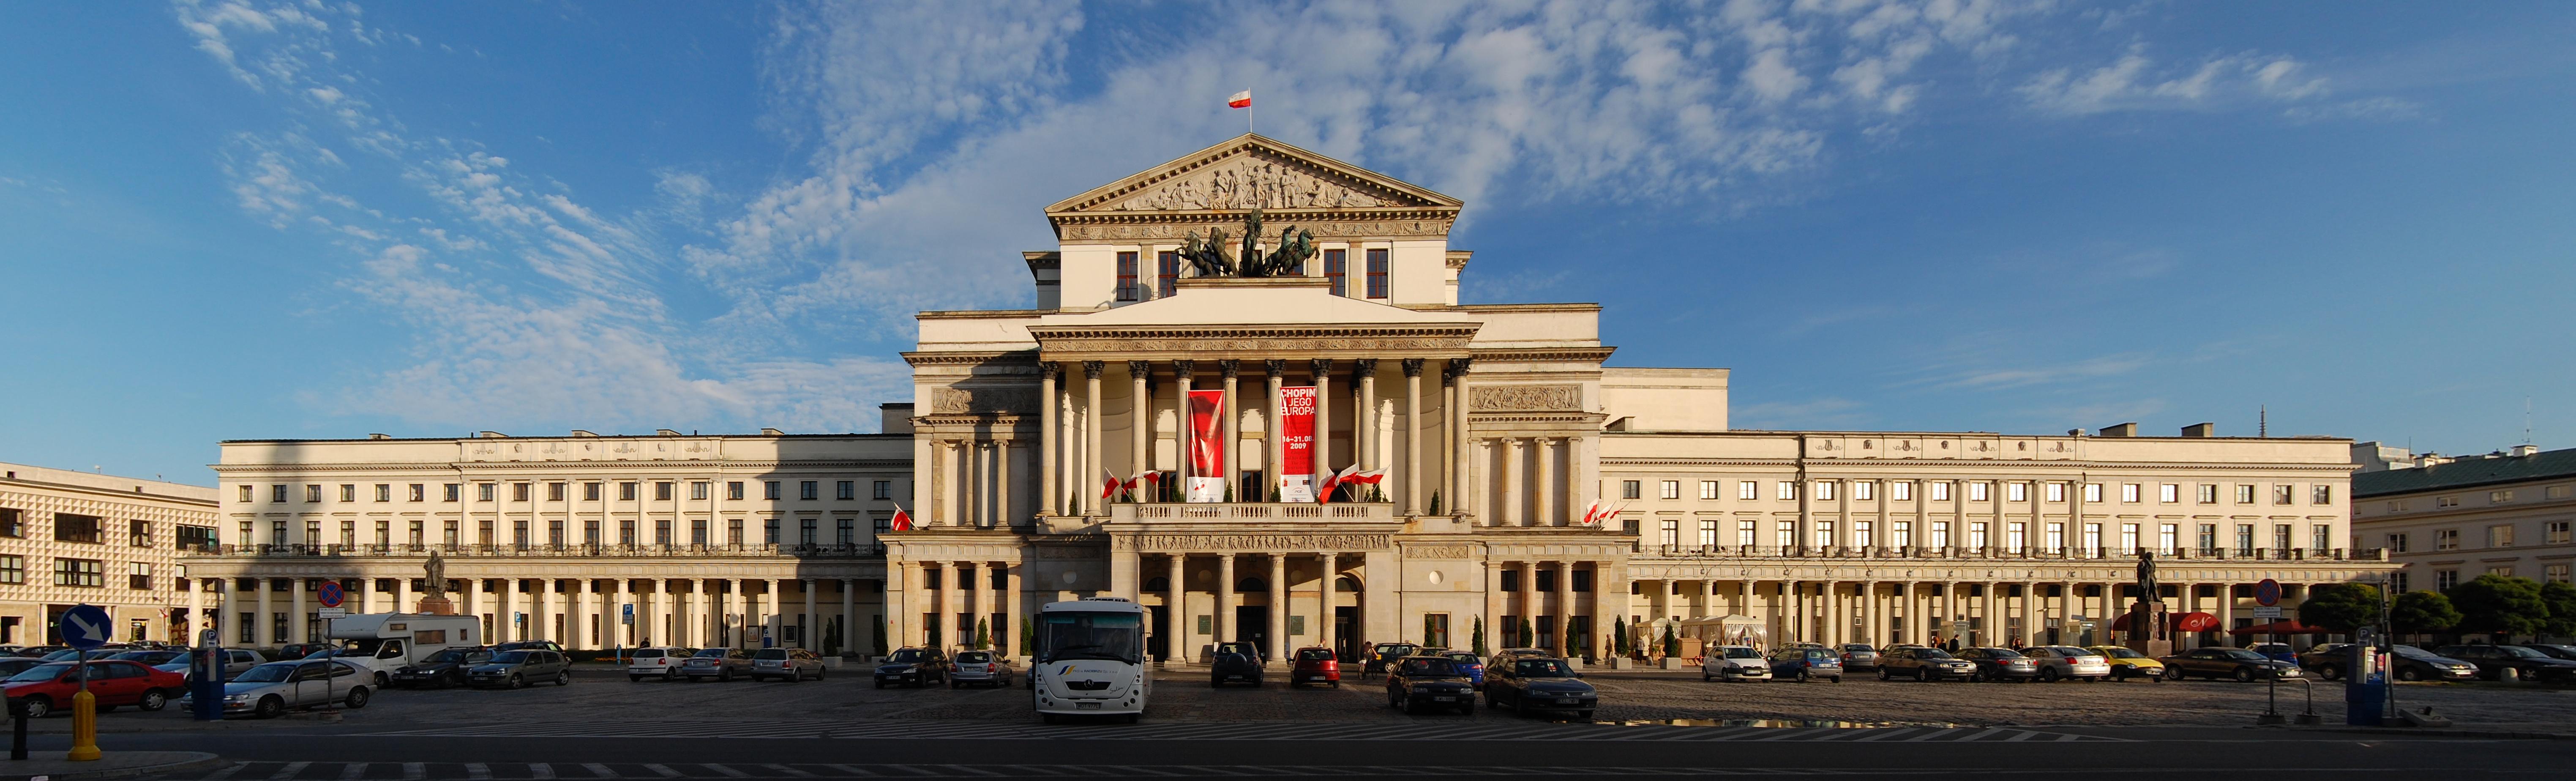 Teatr Wielki (Warschau)